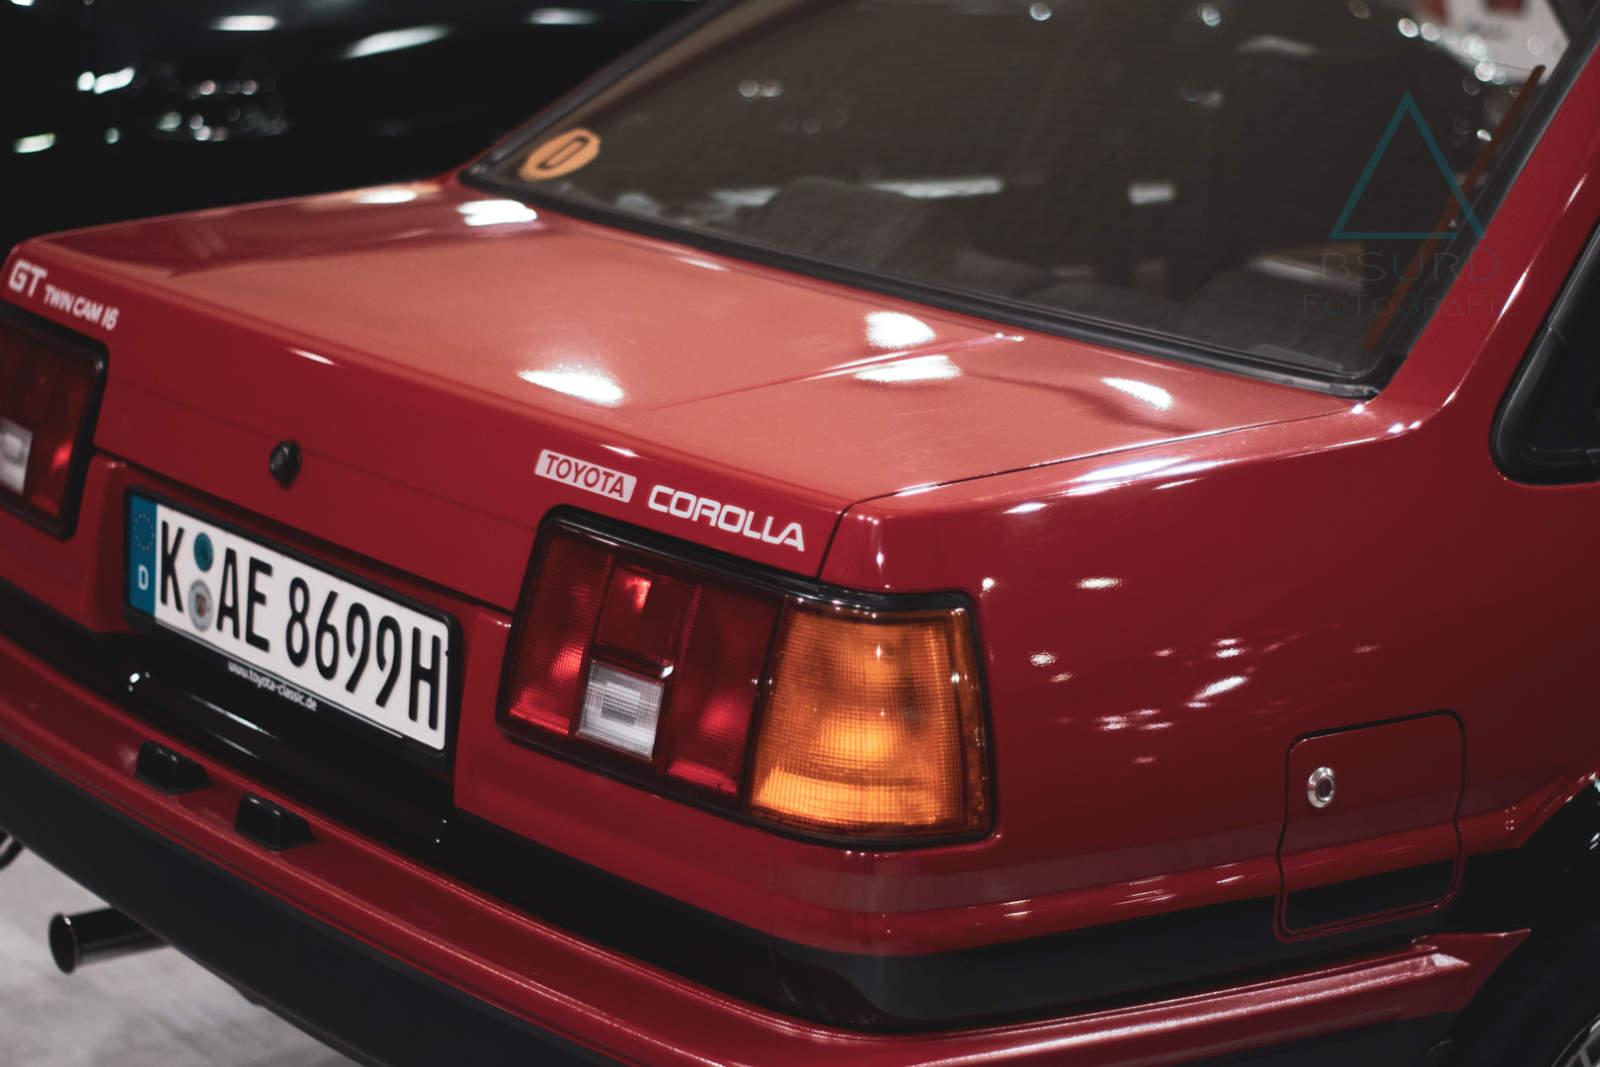 2019-01-05-Toyota-Collection-Koeln - DSC01721-edit-63.jpg